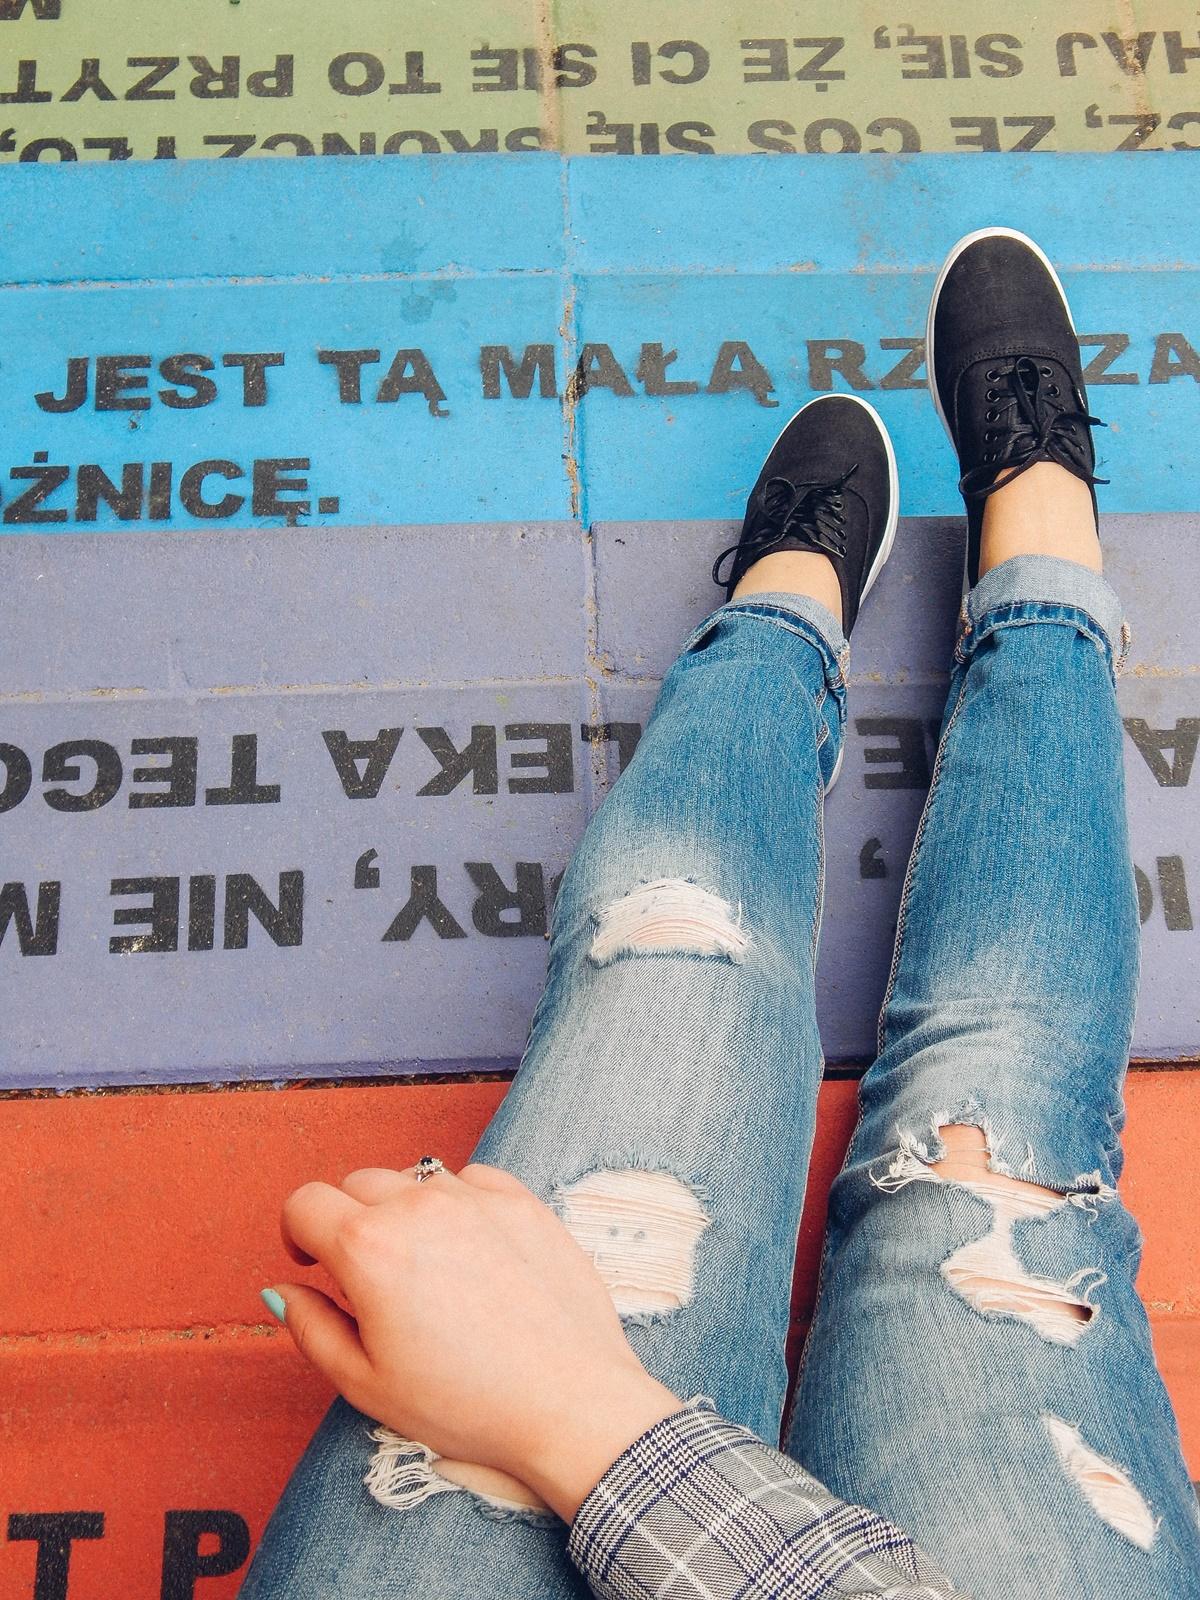 7 nakd zniżka outfit moda blog modowy jak nosić marynarkę w kratkę tshirt z kaktusem jak nosić podarte jeansy vansy moda streetwear style fashion outfit blog lifestyle łódź